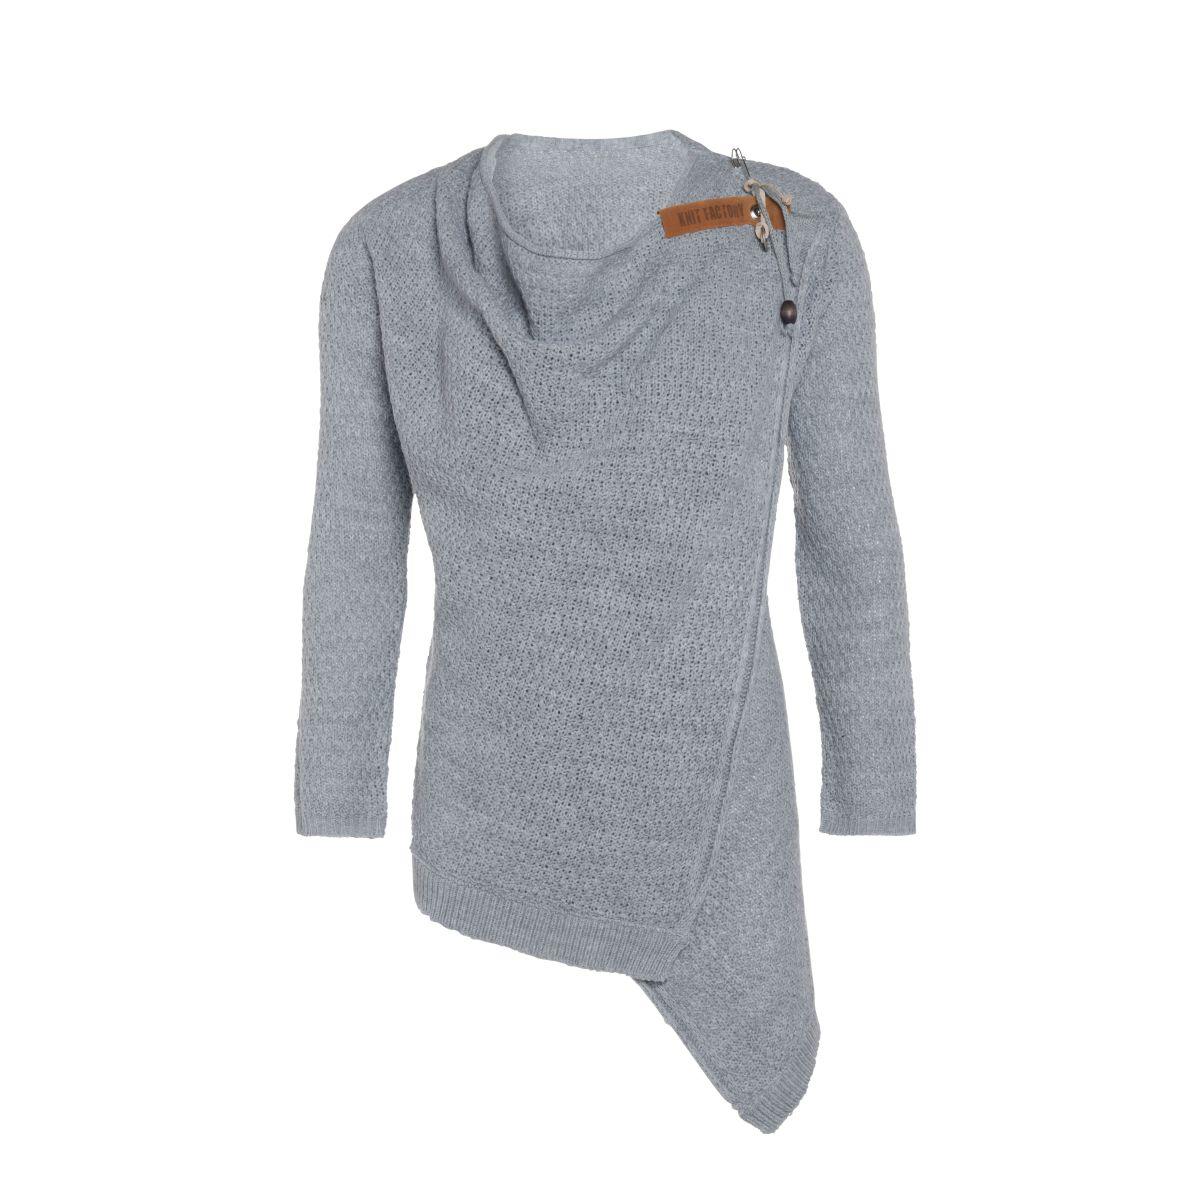 emy knitted cardigan light grey 3638